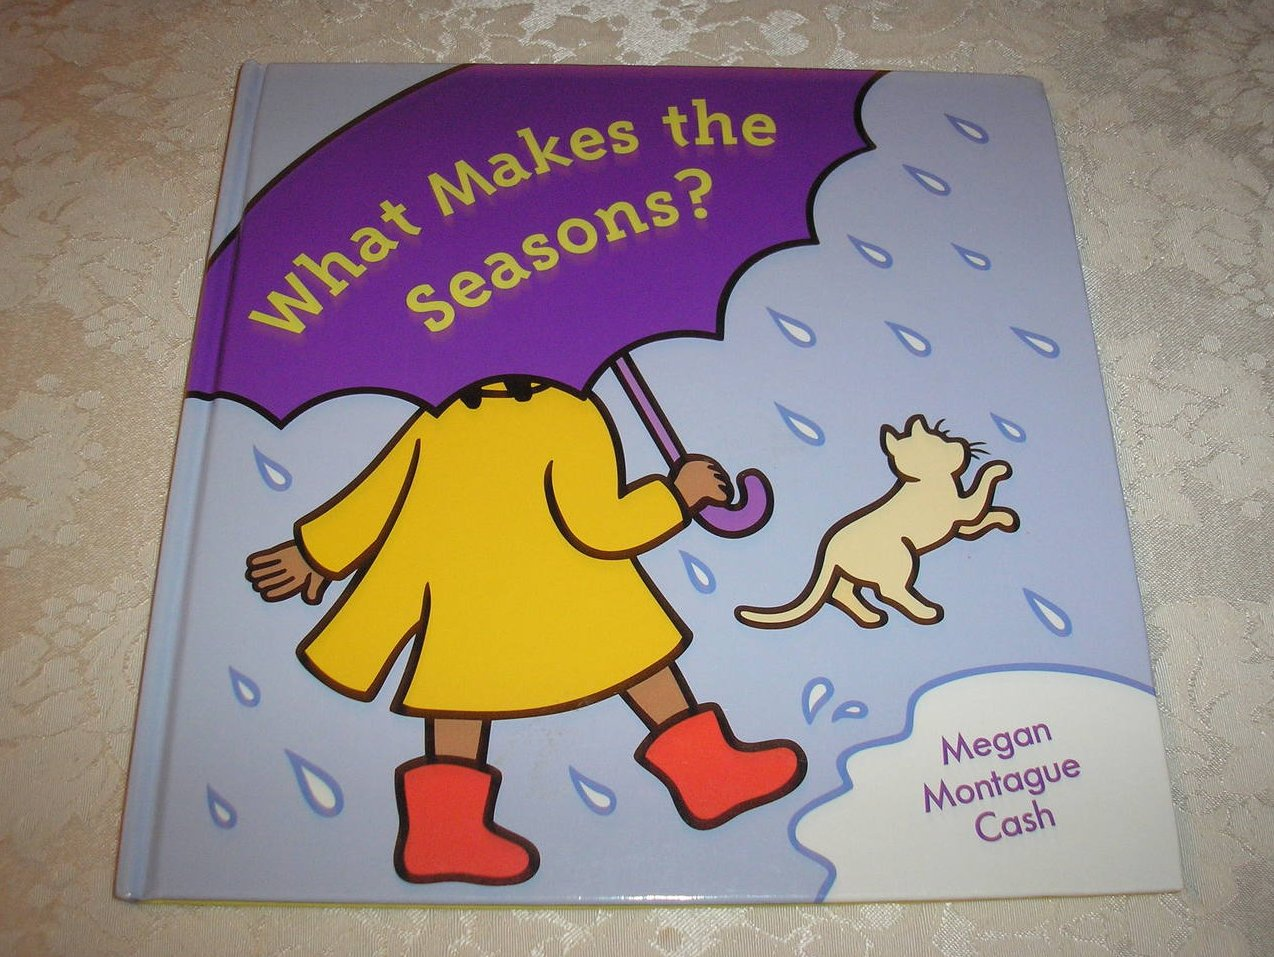 What Makes the Seasons? Megan Montague Cash very good hc